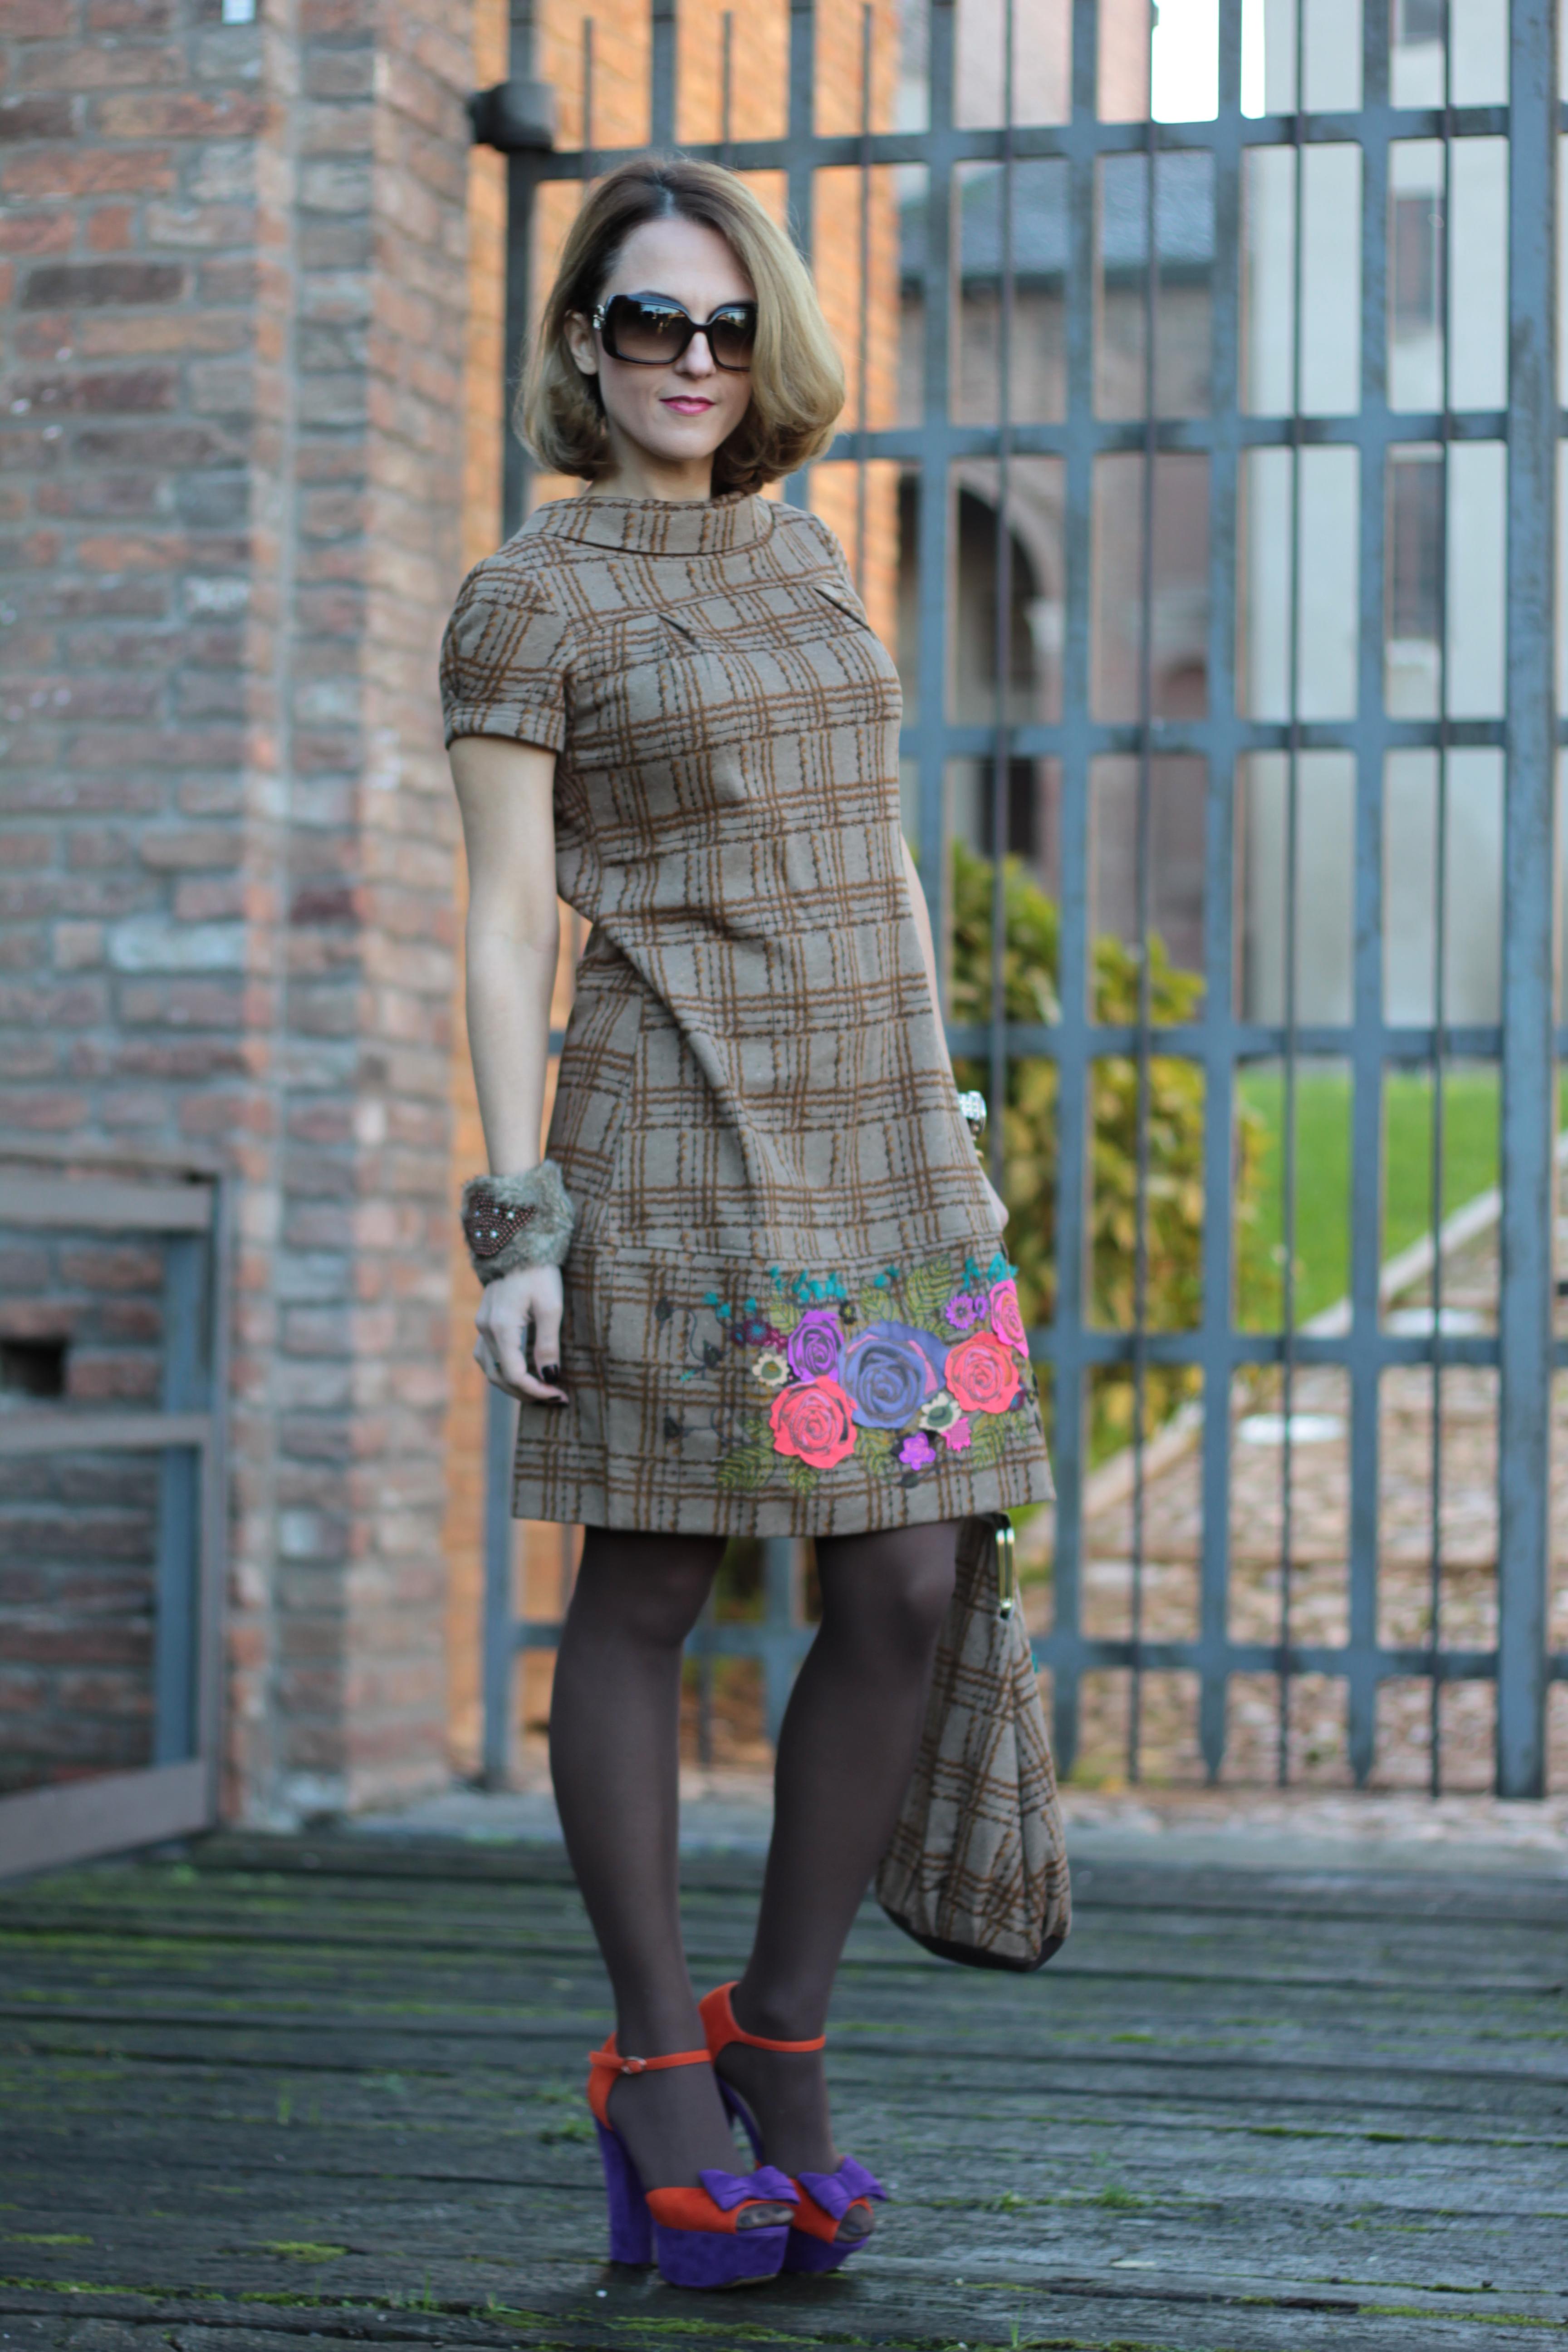 Little Patterned Dress | Upbeat Soles | Orlando Florida